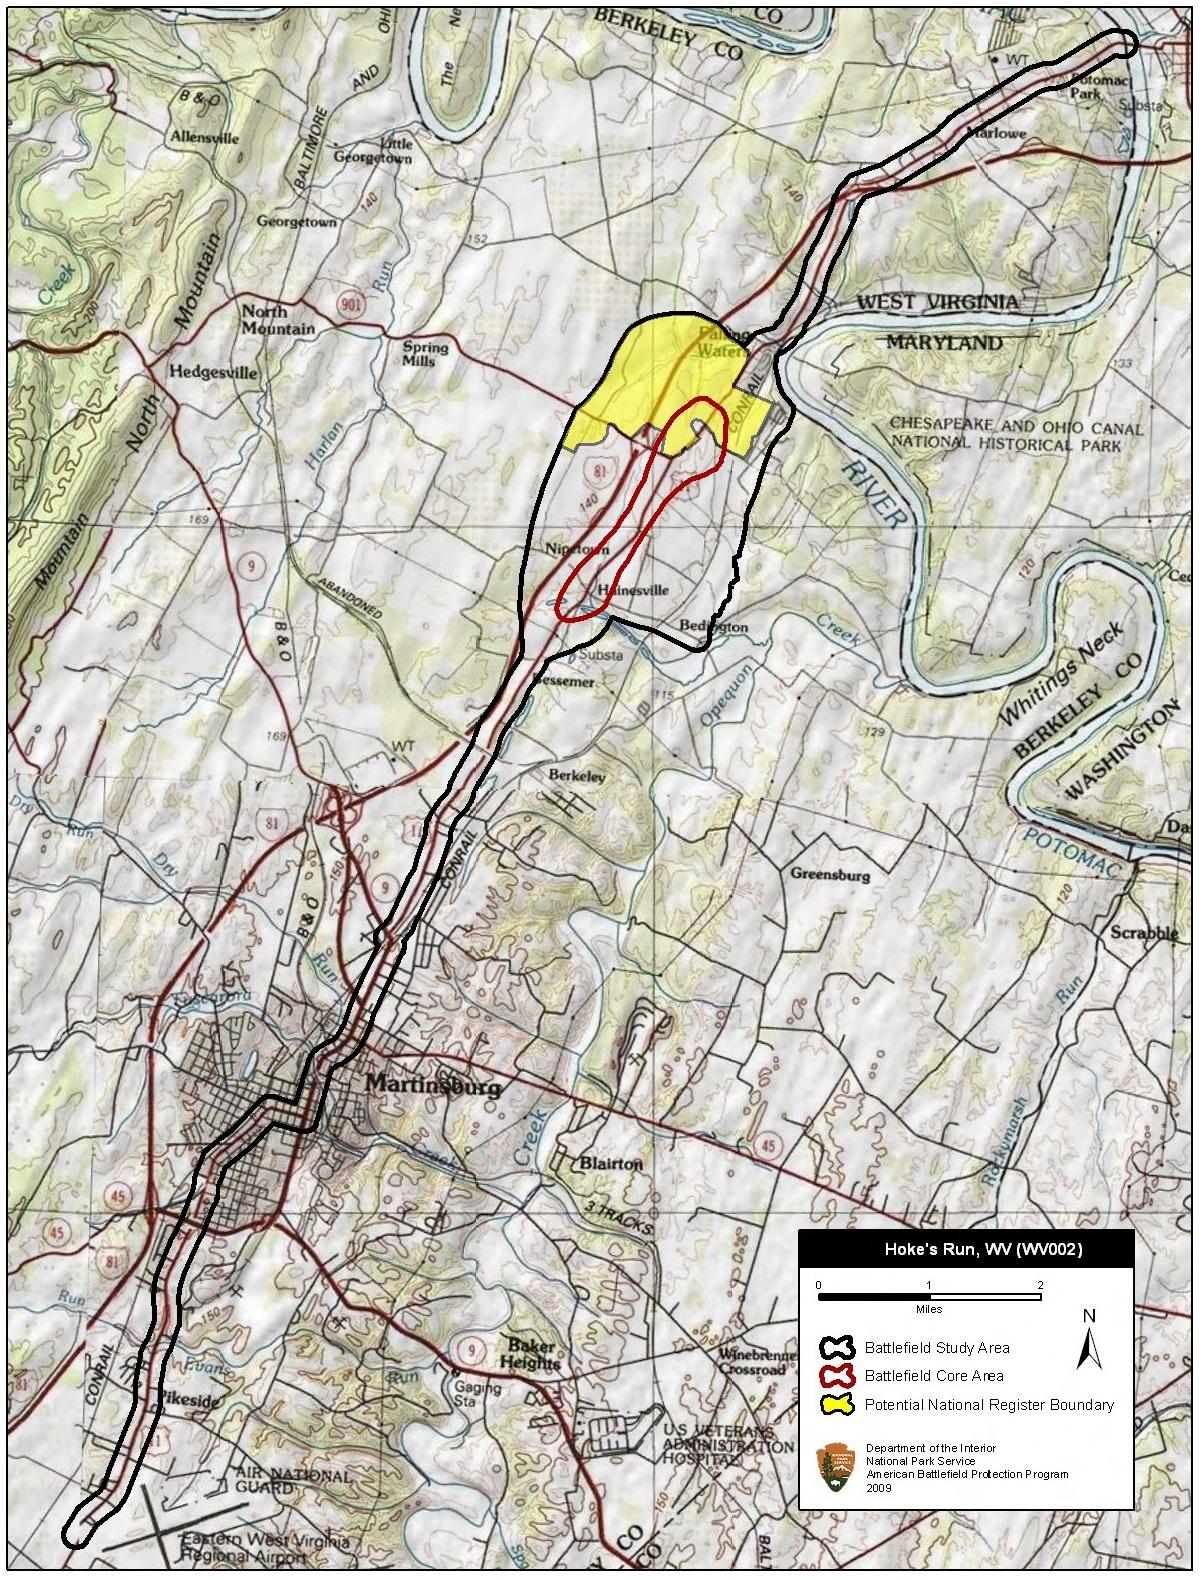 Battle of Hoke's Run - Wikipedia